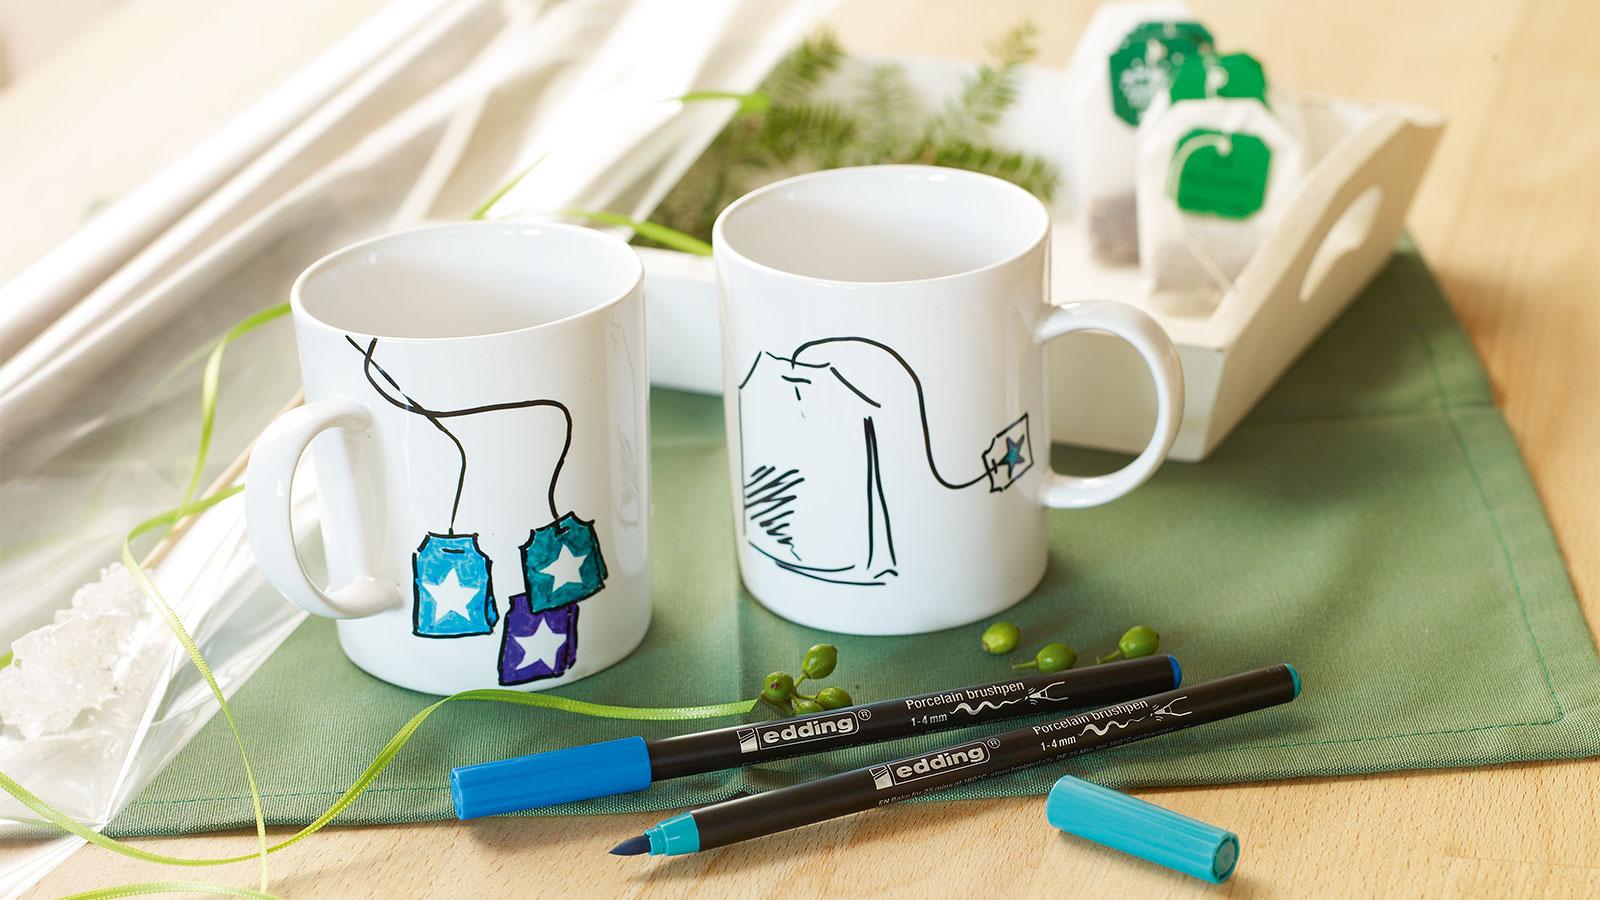 Design your own coffee mug - Ideas - edding